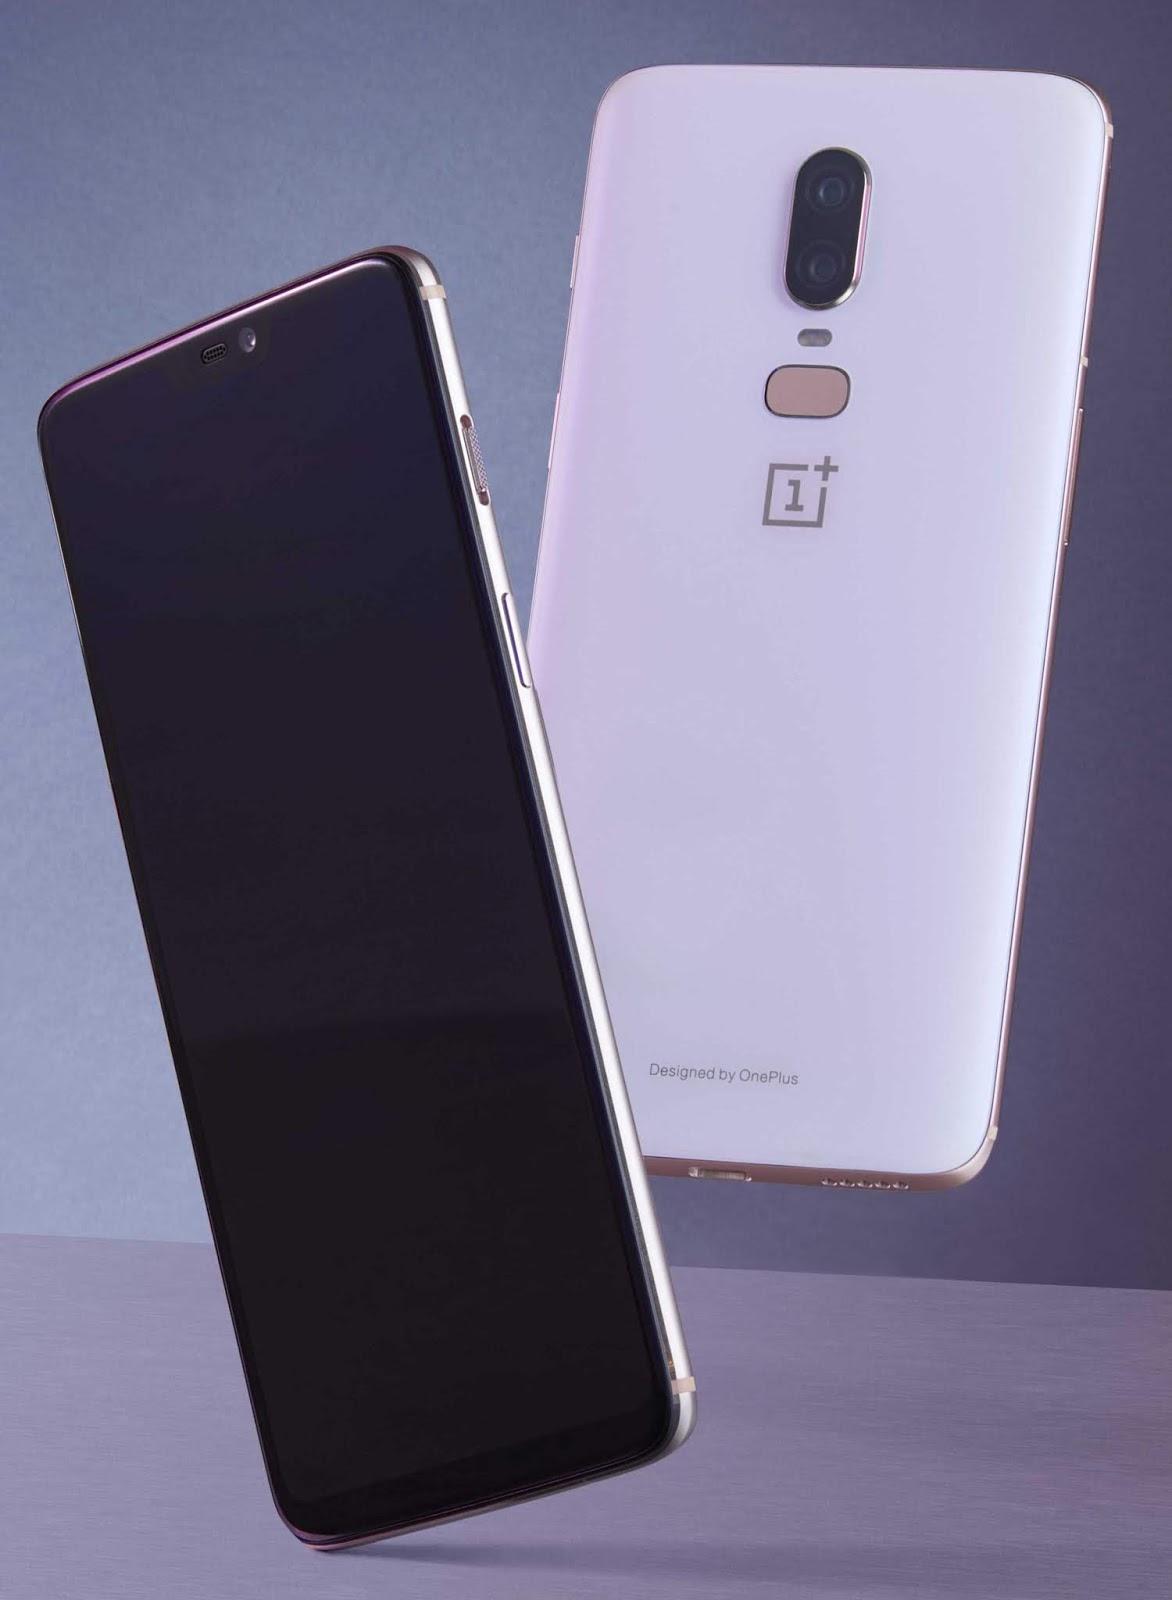 SPIRIT OF MUMBAI: OnePlus emerges as the No 1 premium smartphone